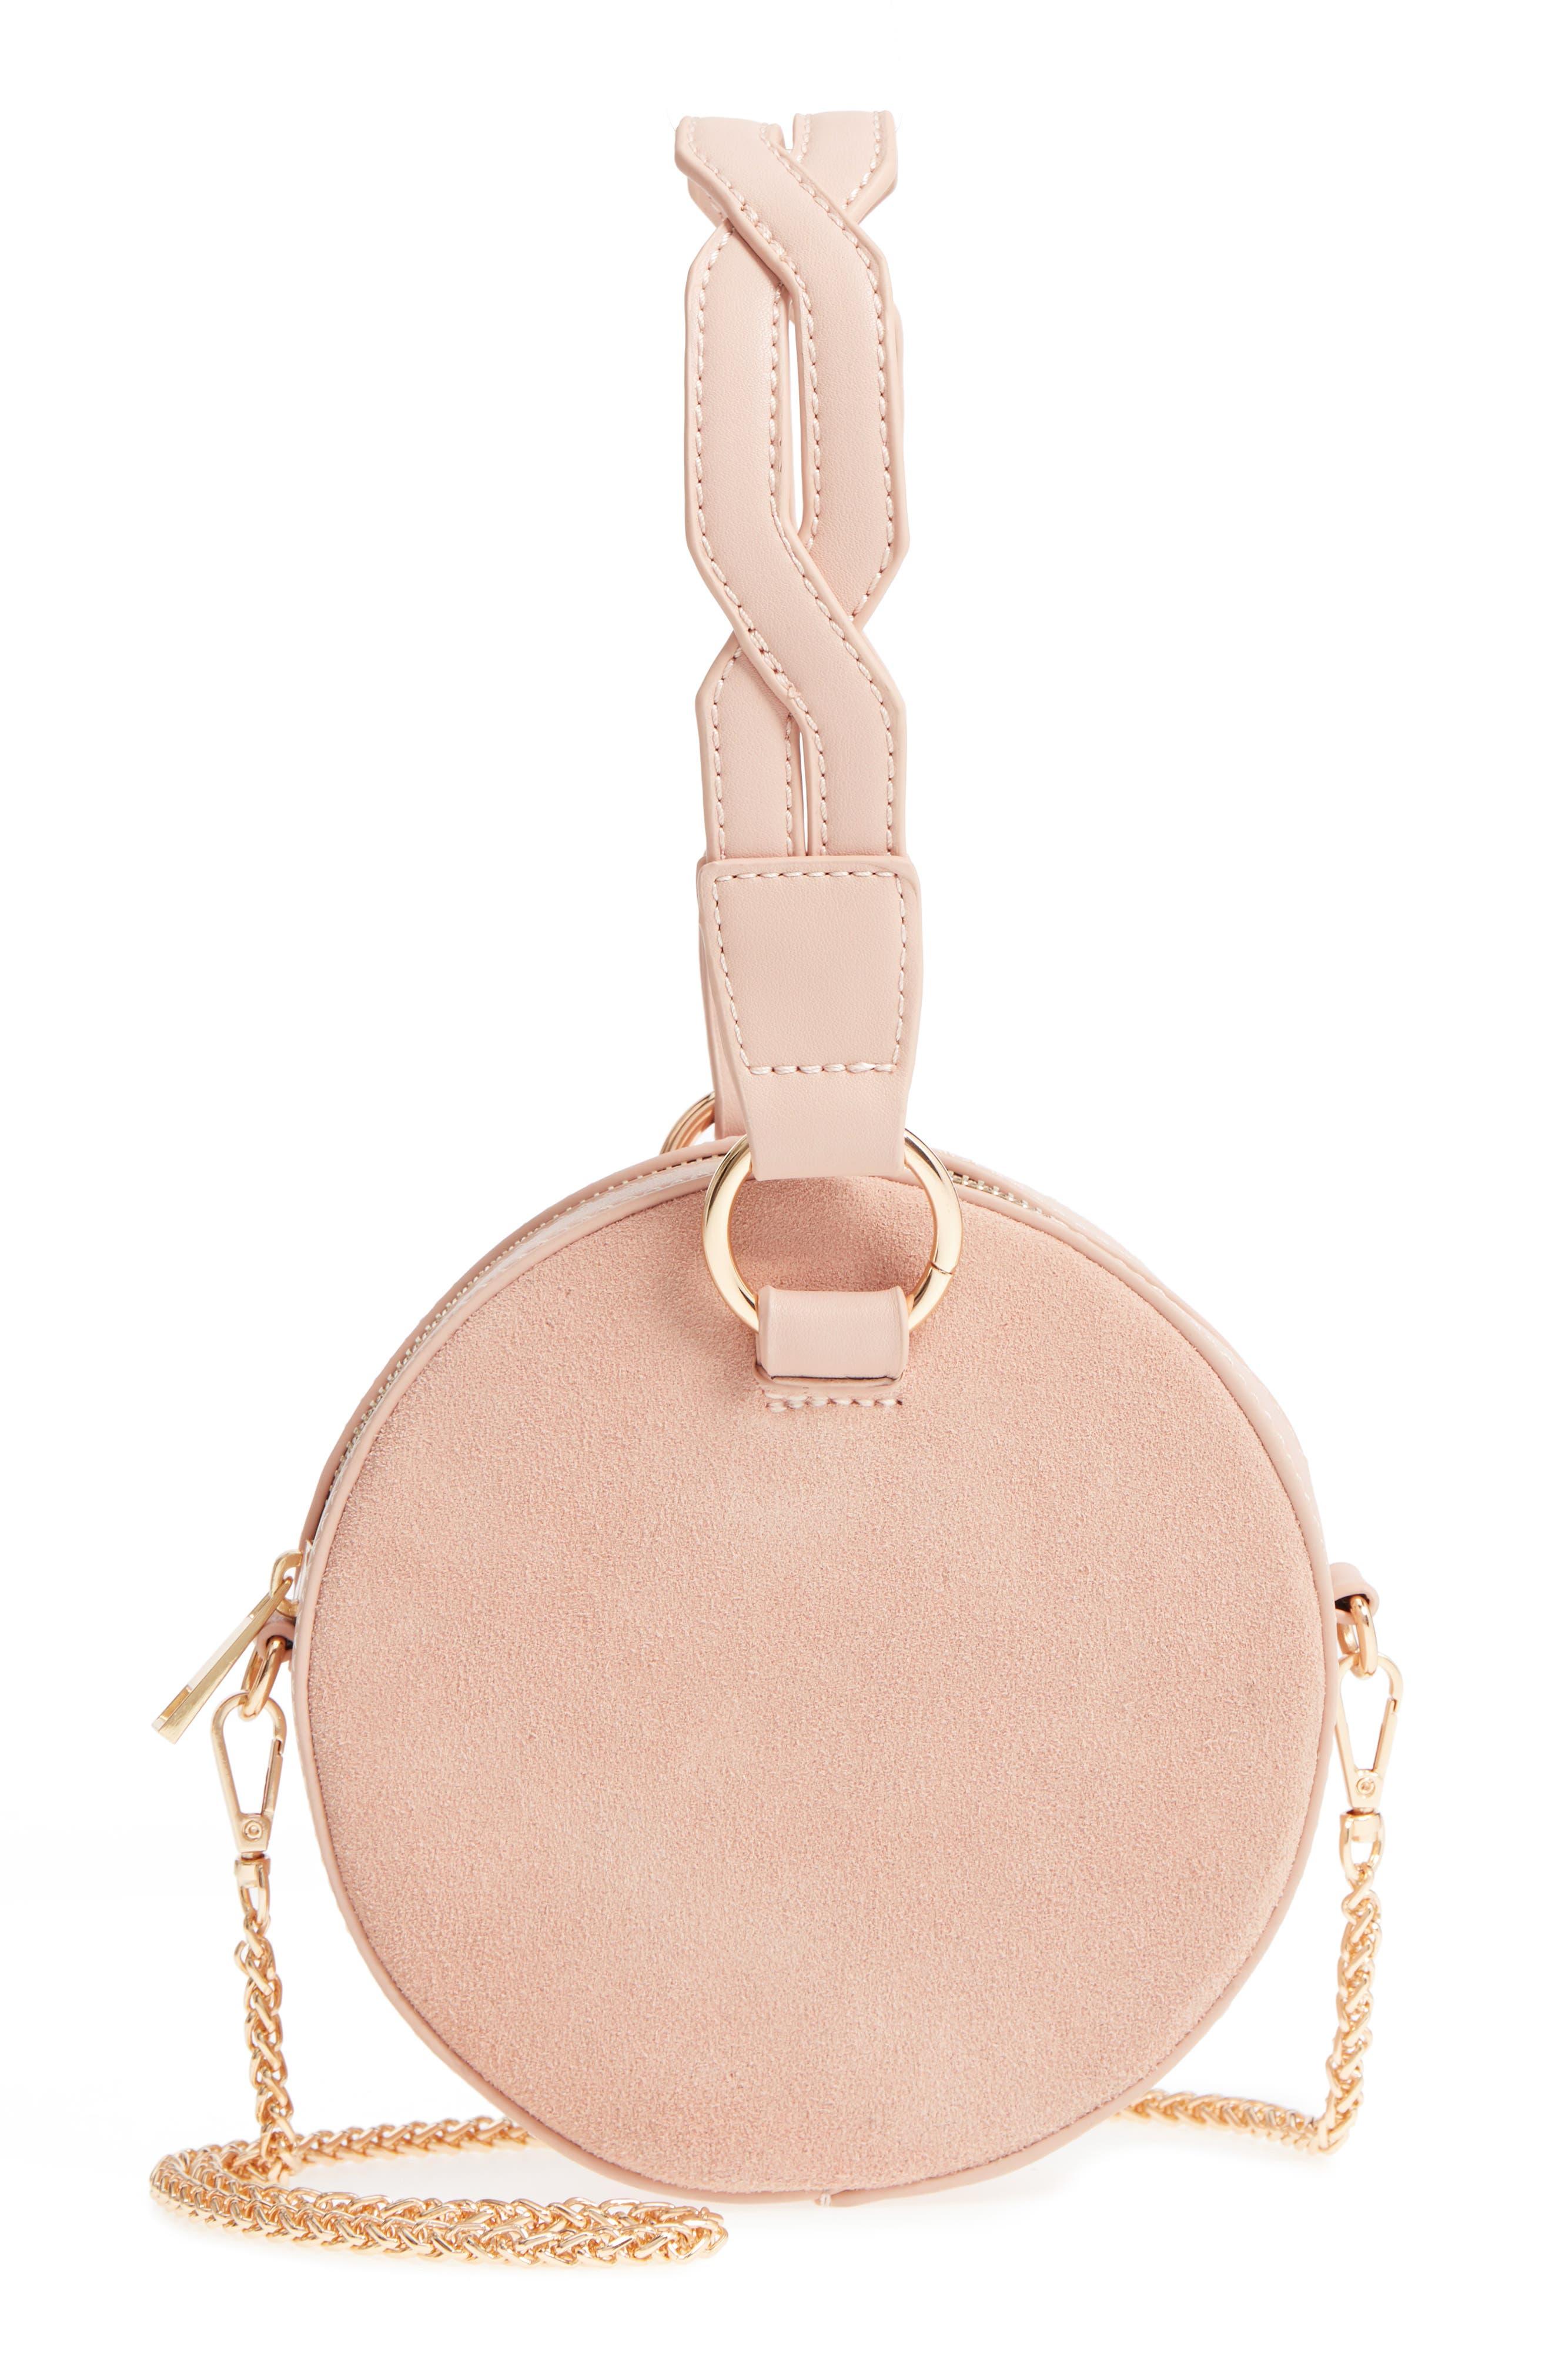 Circle Bag with Wristlet,                             Main thumbnail 1, color,                             Tan